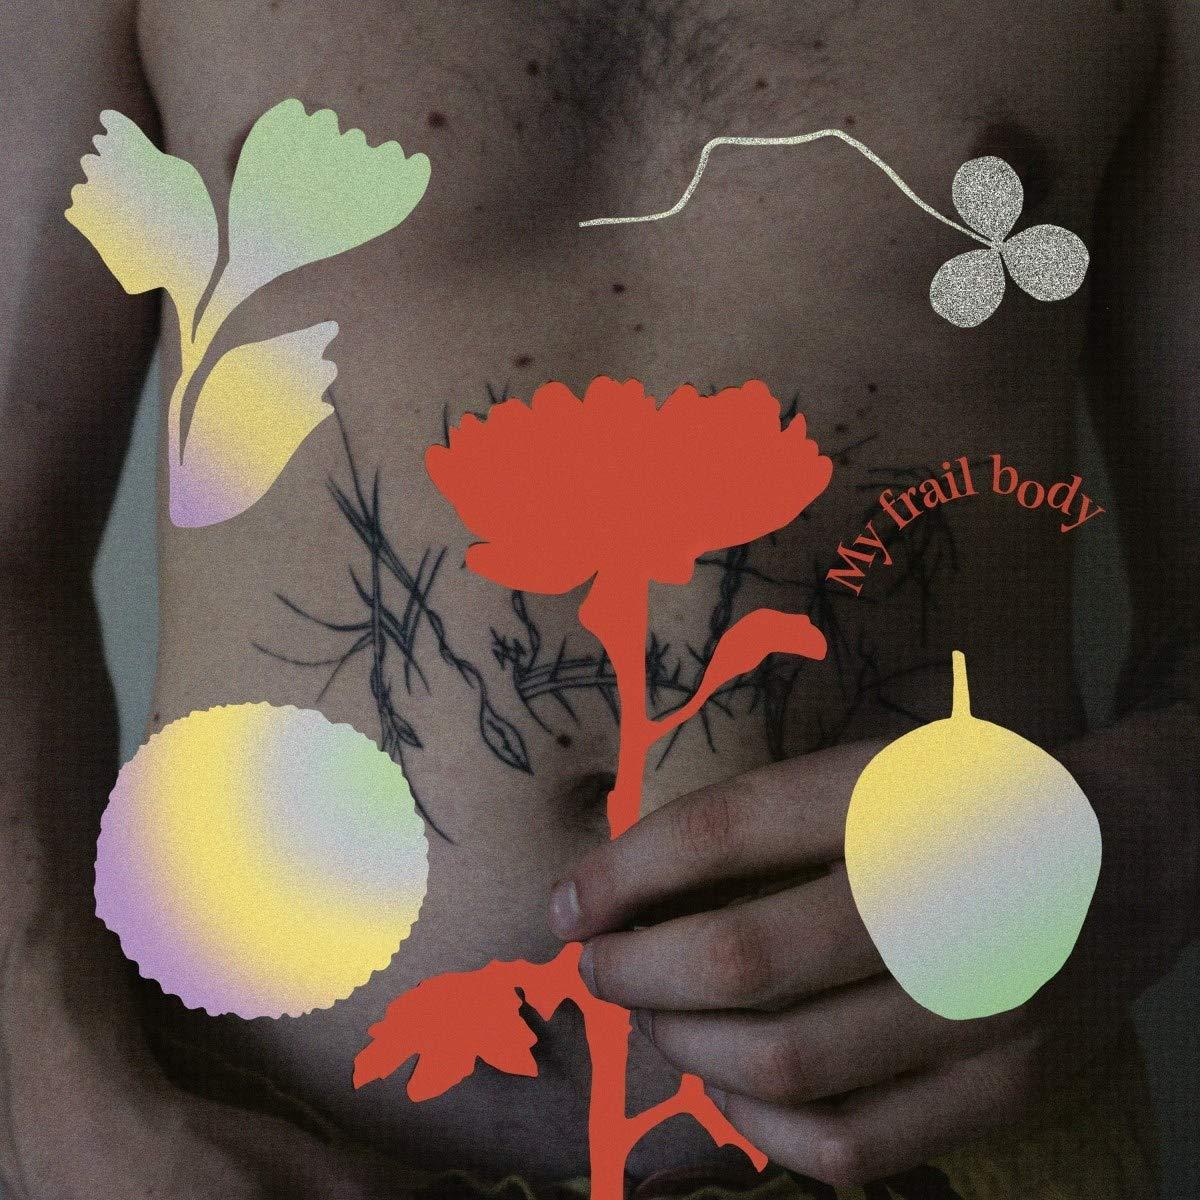 Gundelach-My Frail Body-(UCK030CD)-CD-FLAC-2020-WRE